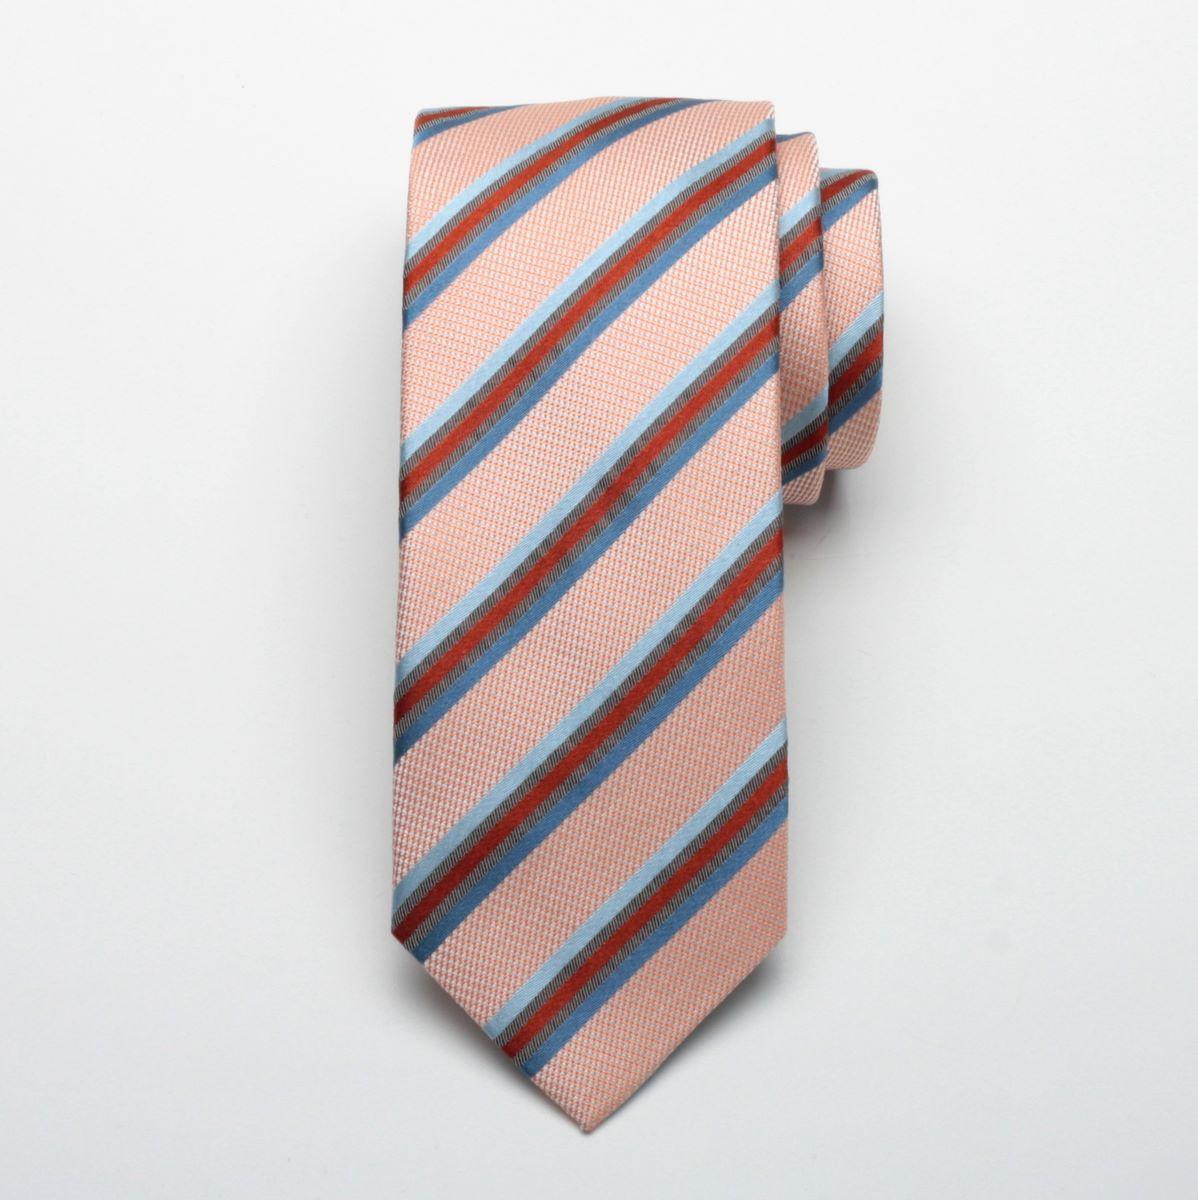 Krawat jedwabny Fine Selection (wzór 69)